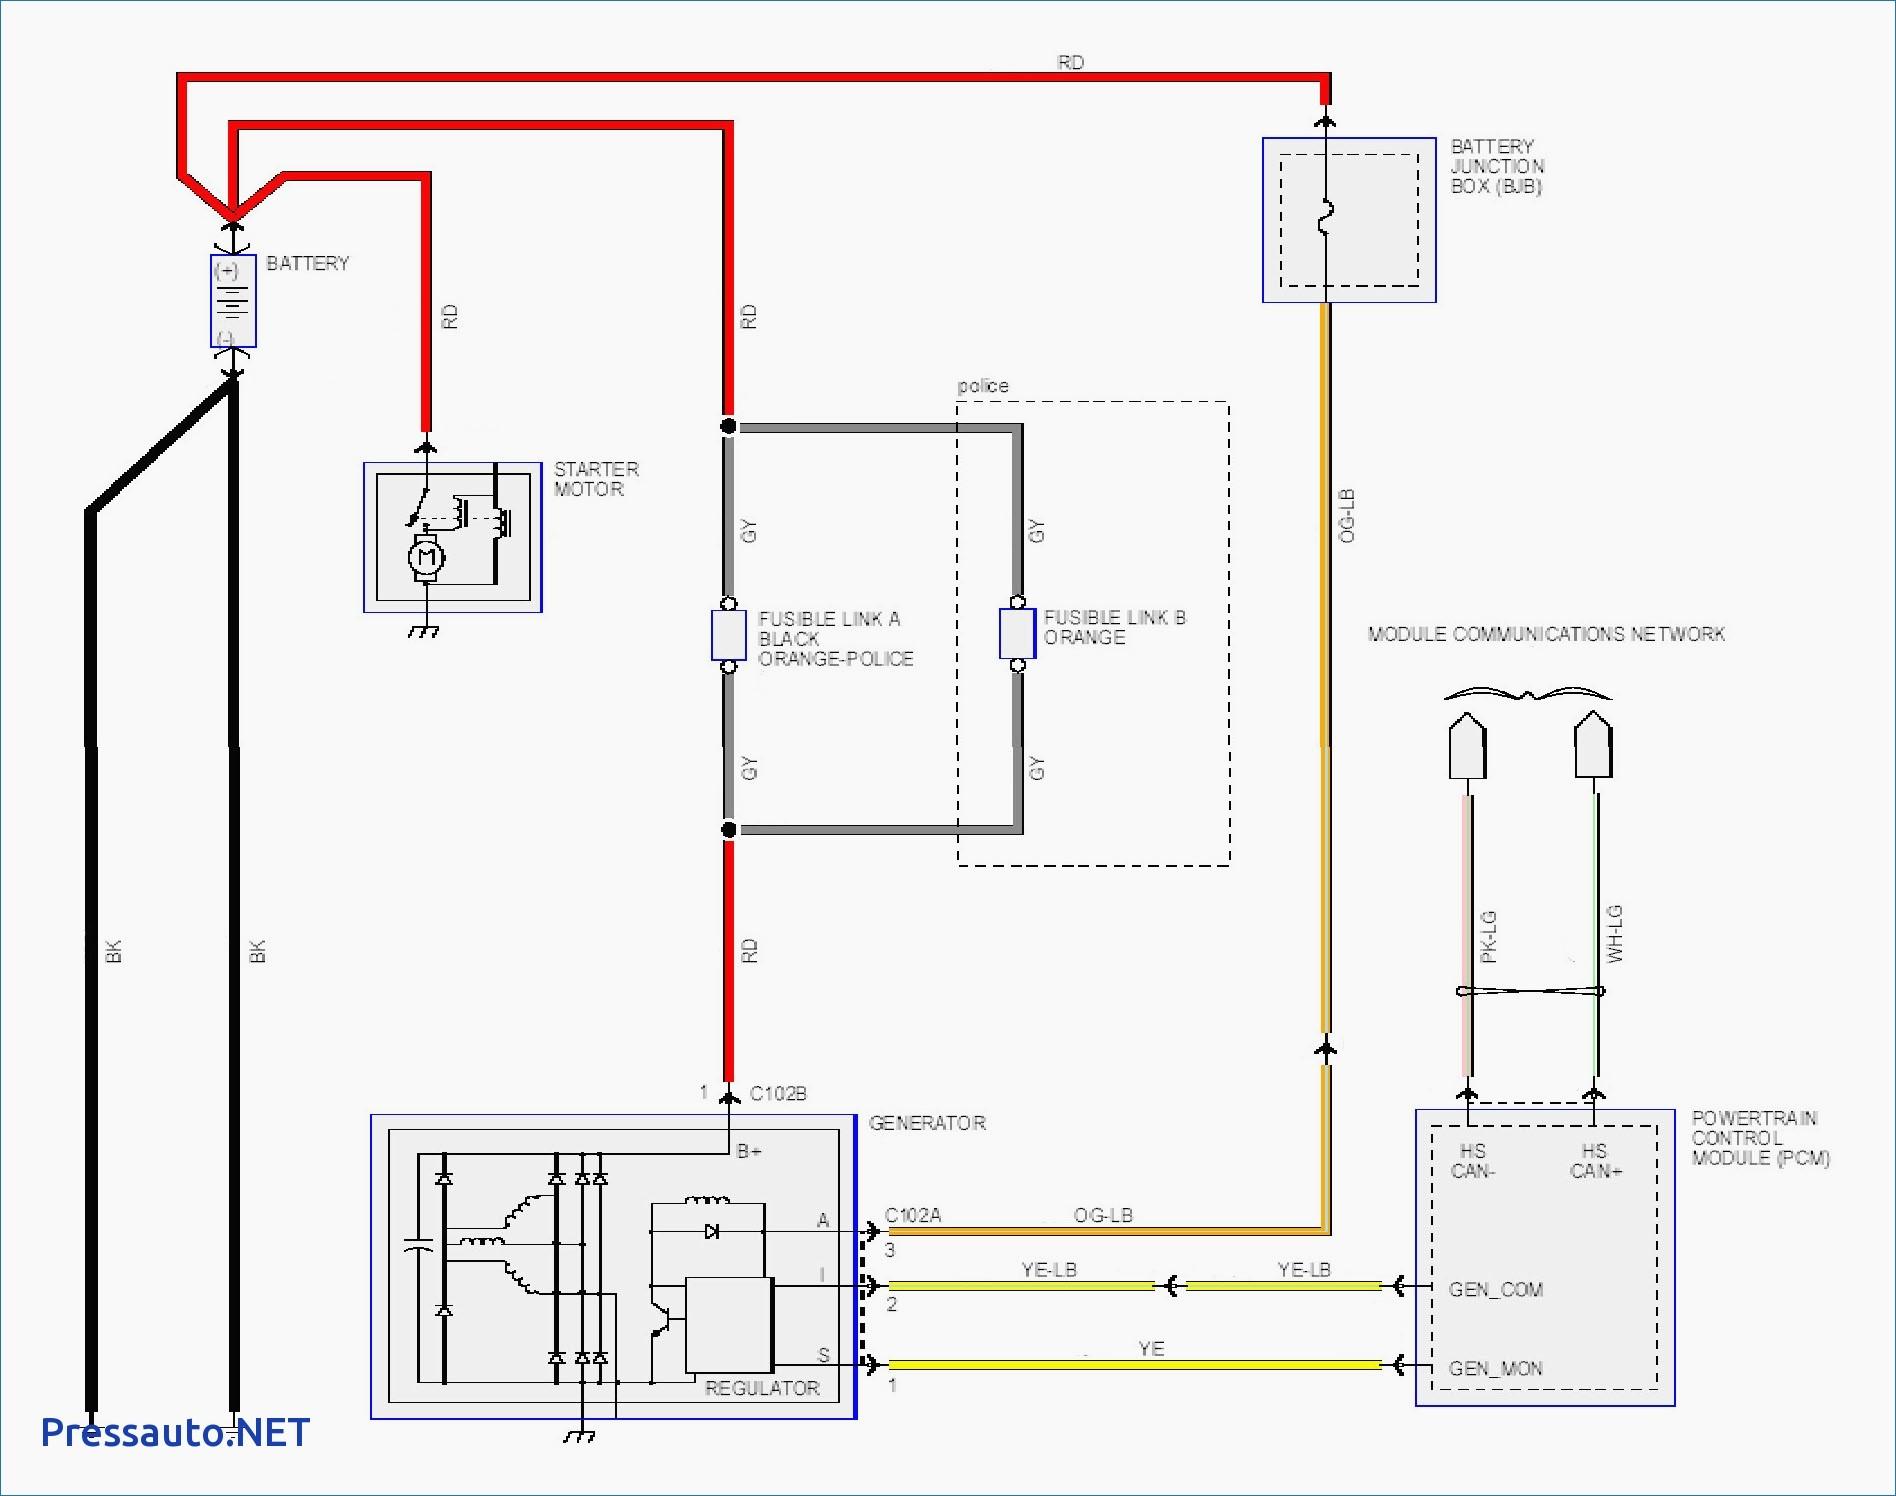 2000 Lincoln Town Car Wiring Diagram Wiring Diagram